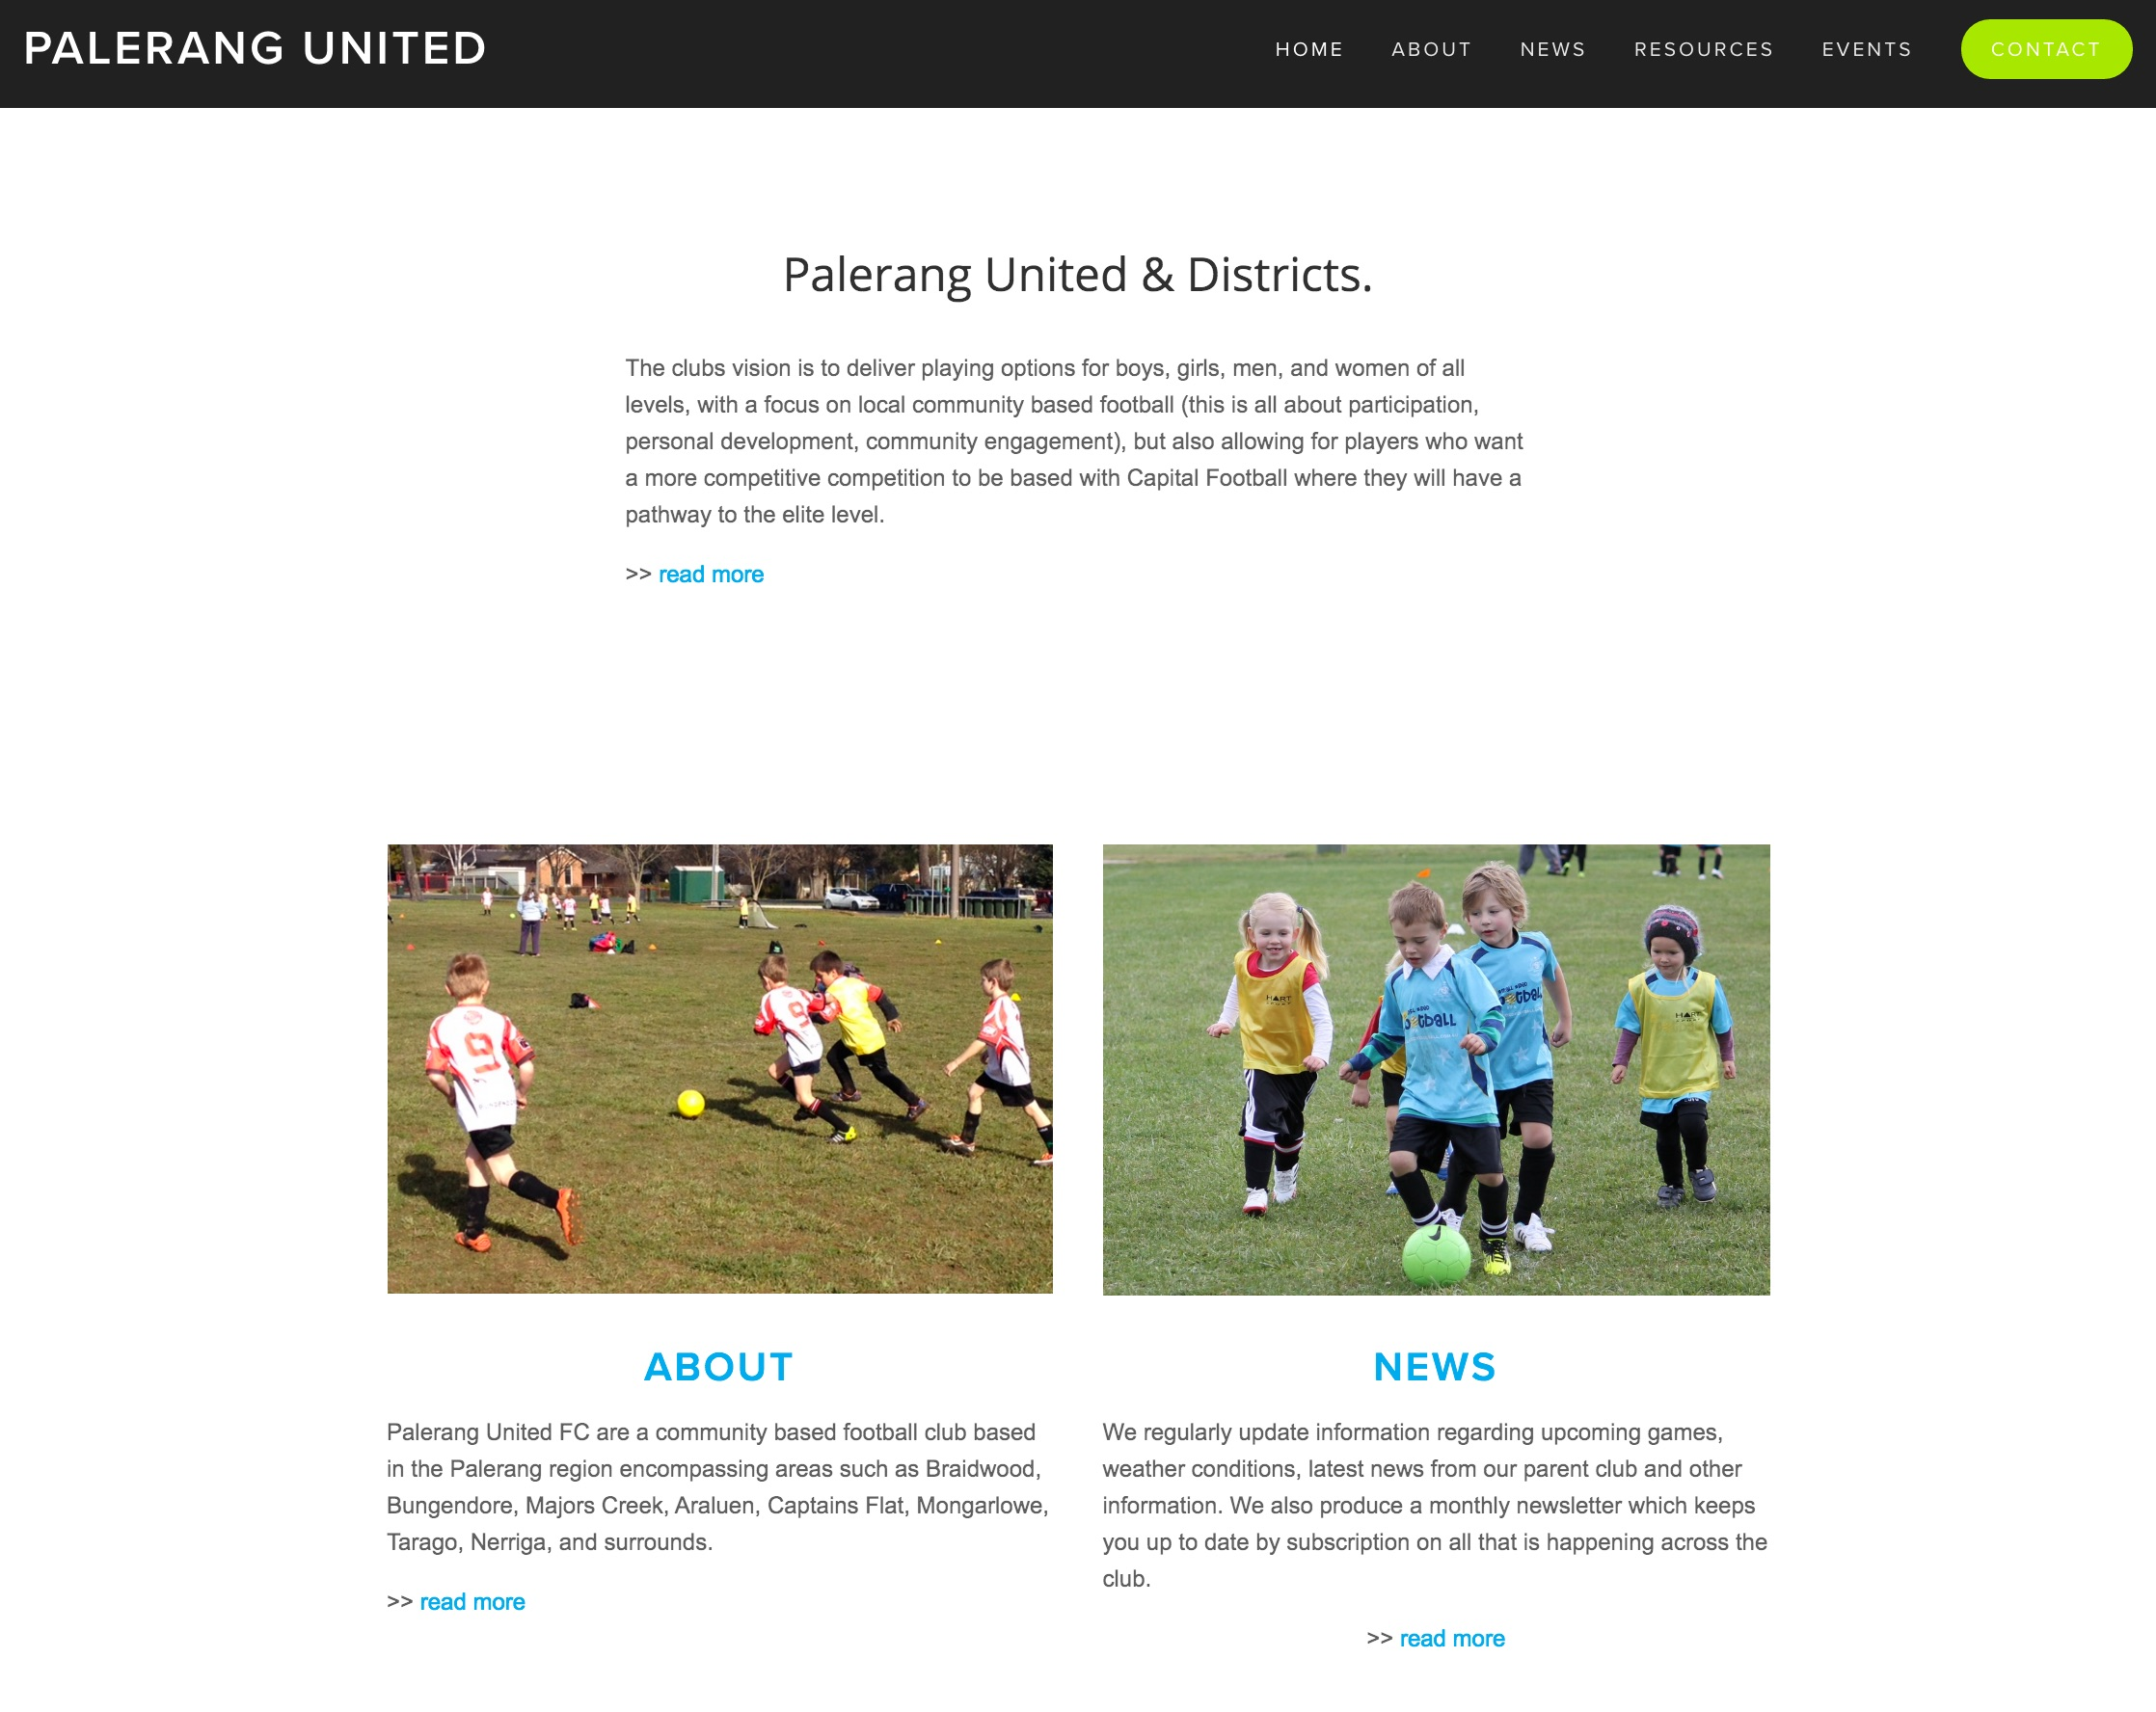 palerang-united